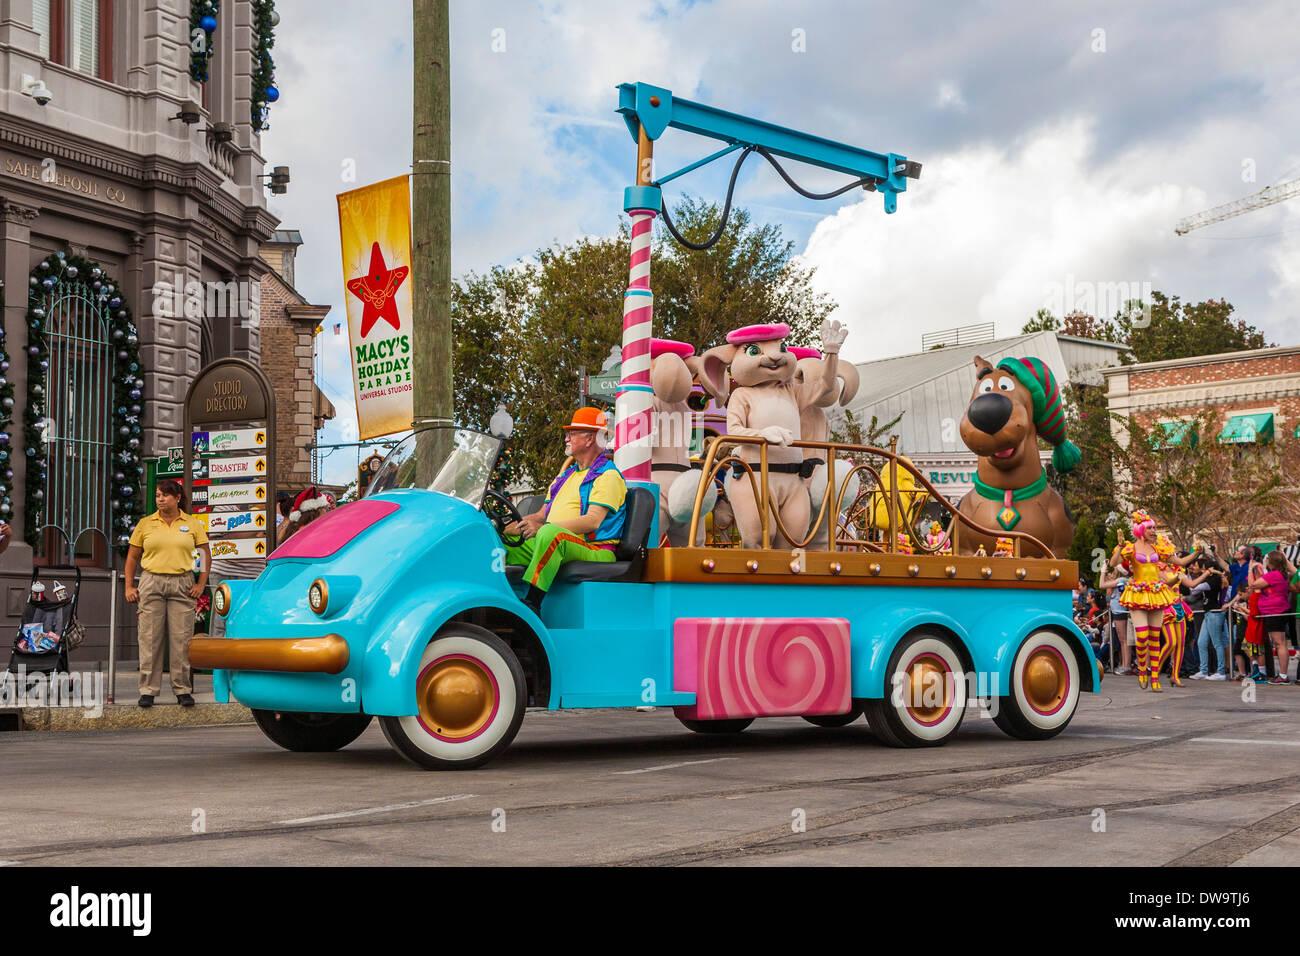 Cartoon characters in parade at Universal Studios theme park in Orlando, Florida - Stock Image